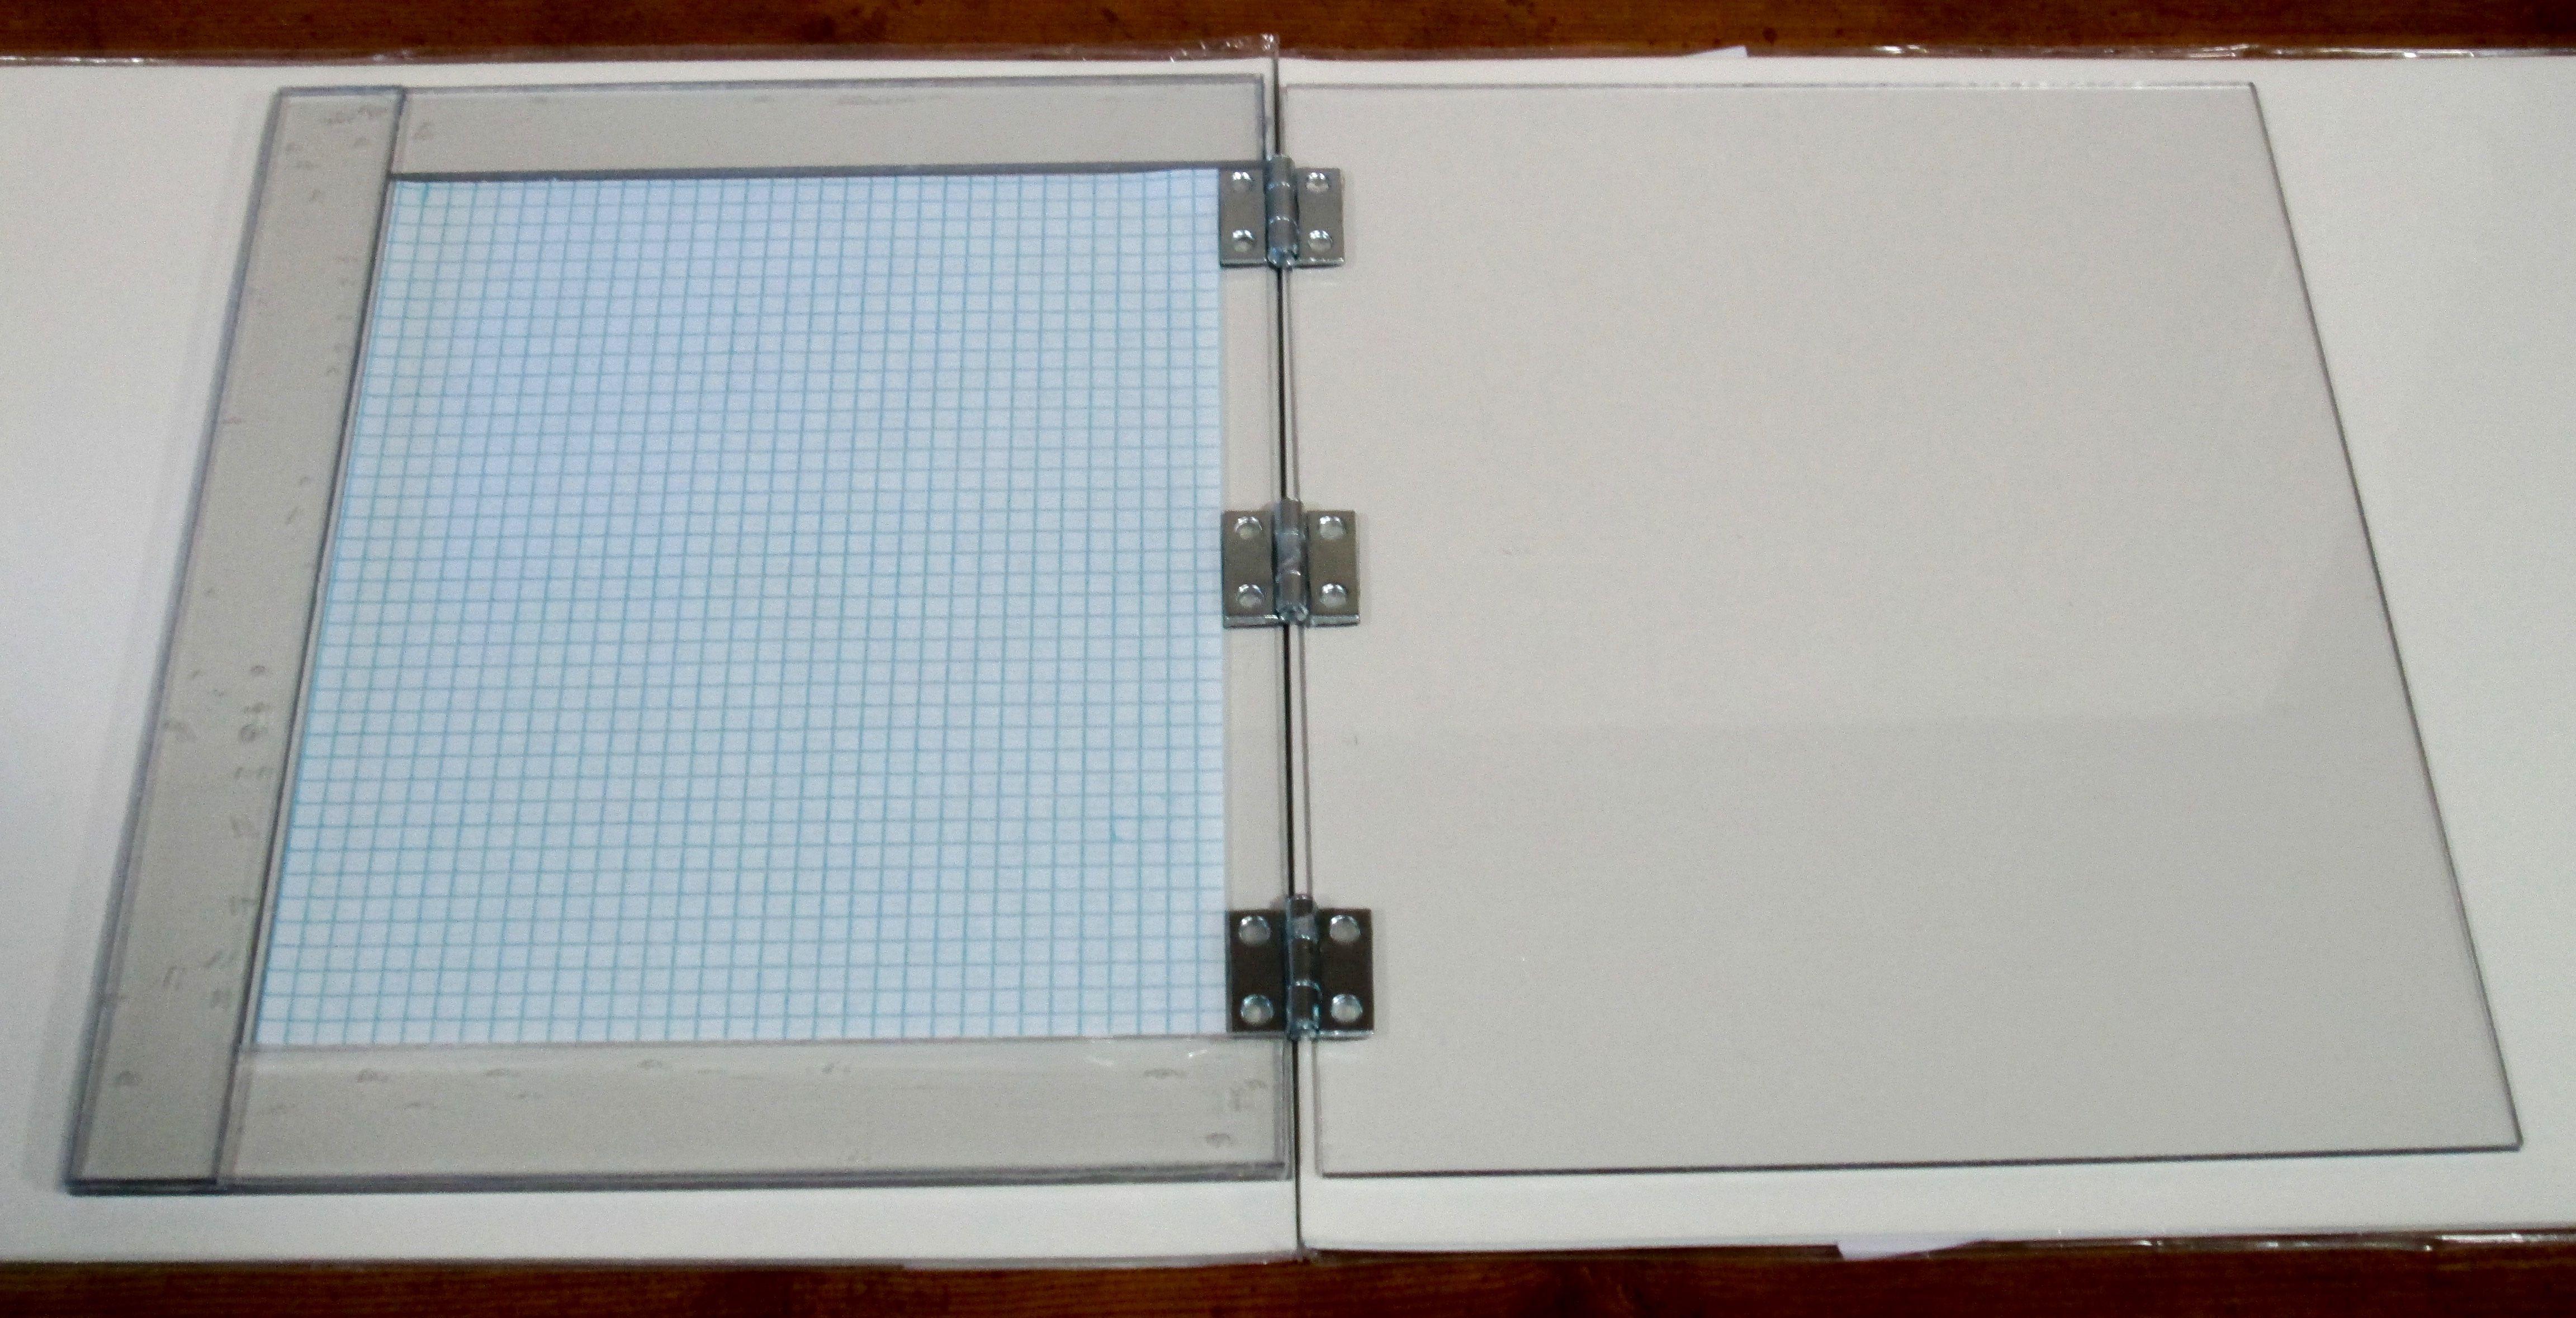 DIY JOSI Joyful Optimal Stamping Instrument. Three 1